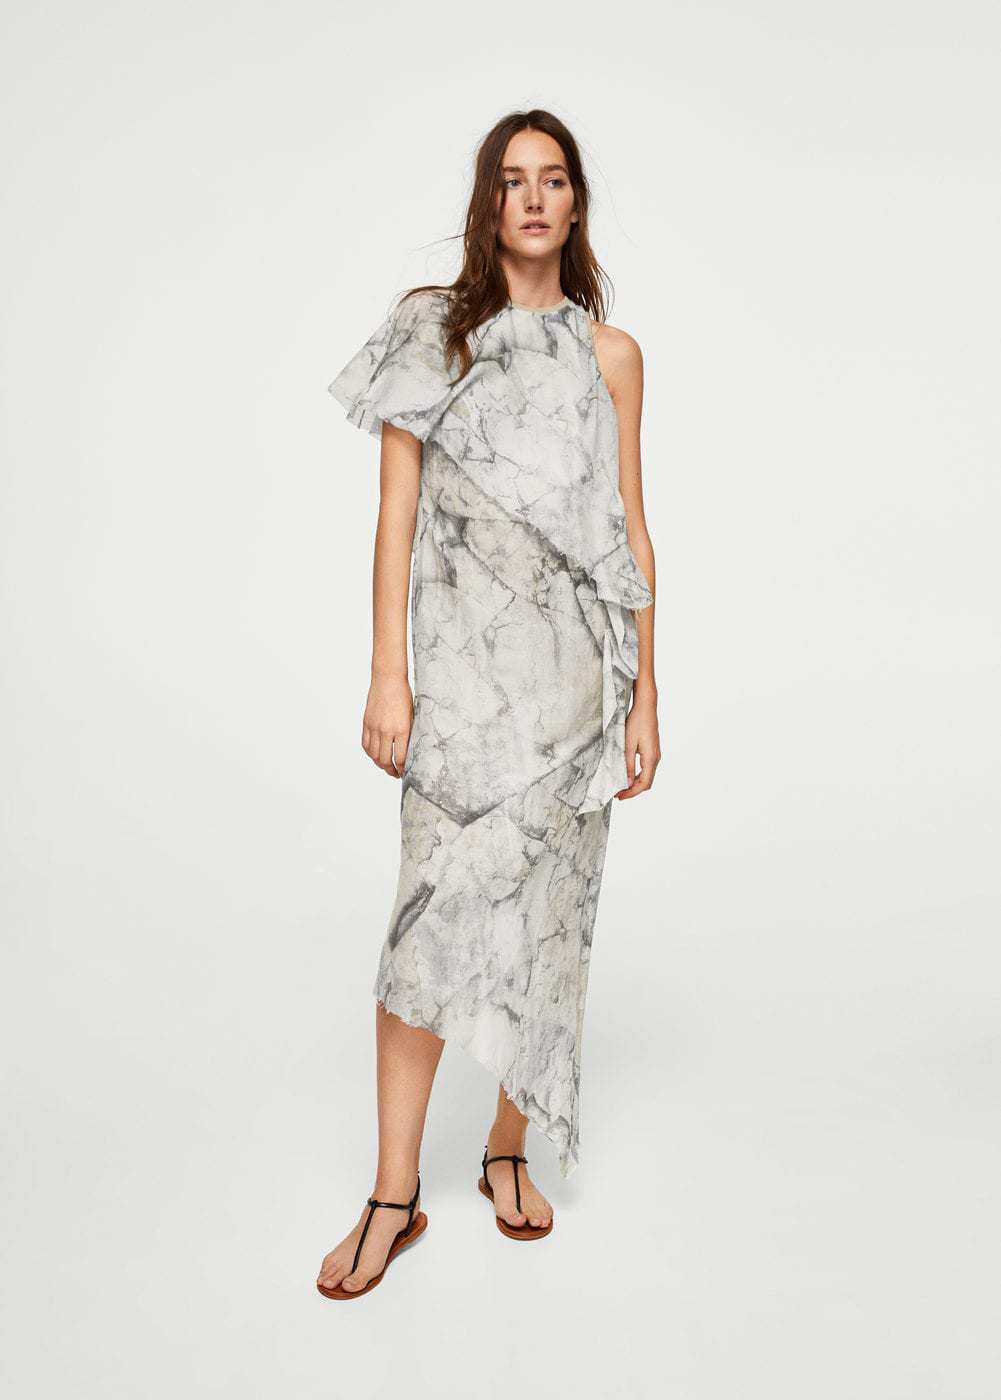 Gray and white asymmetric ruffle tie-dye midi dress with asymmetrical hem